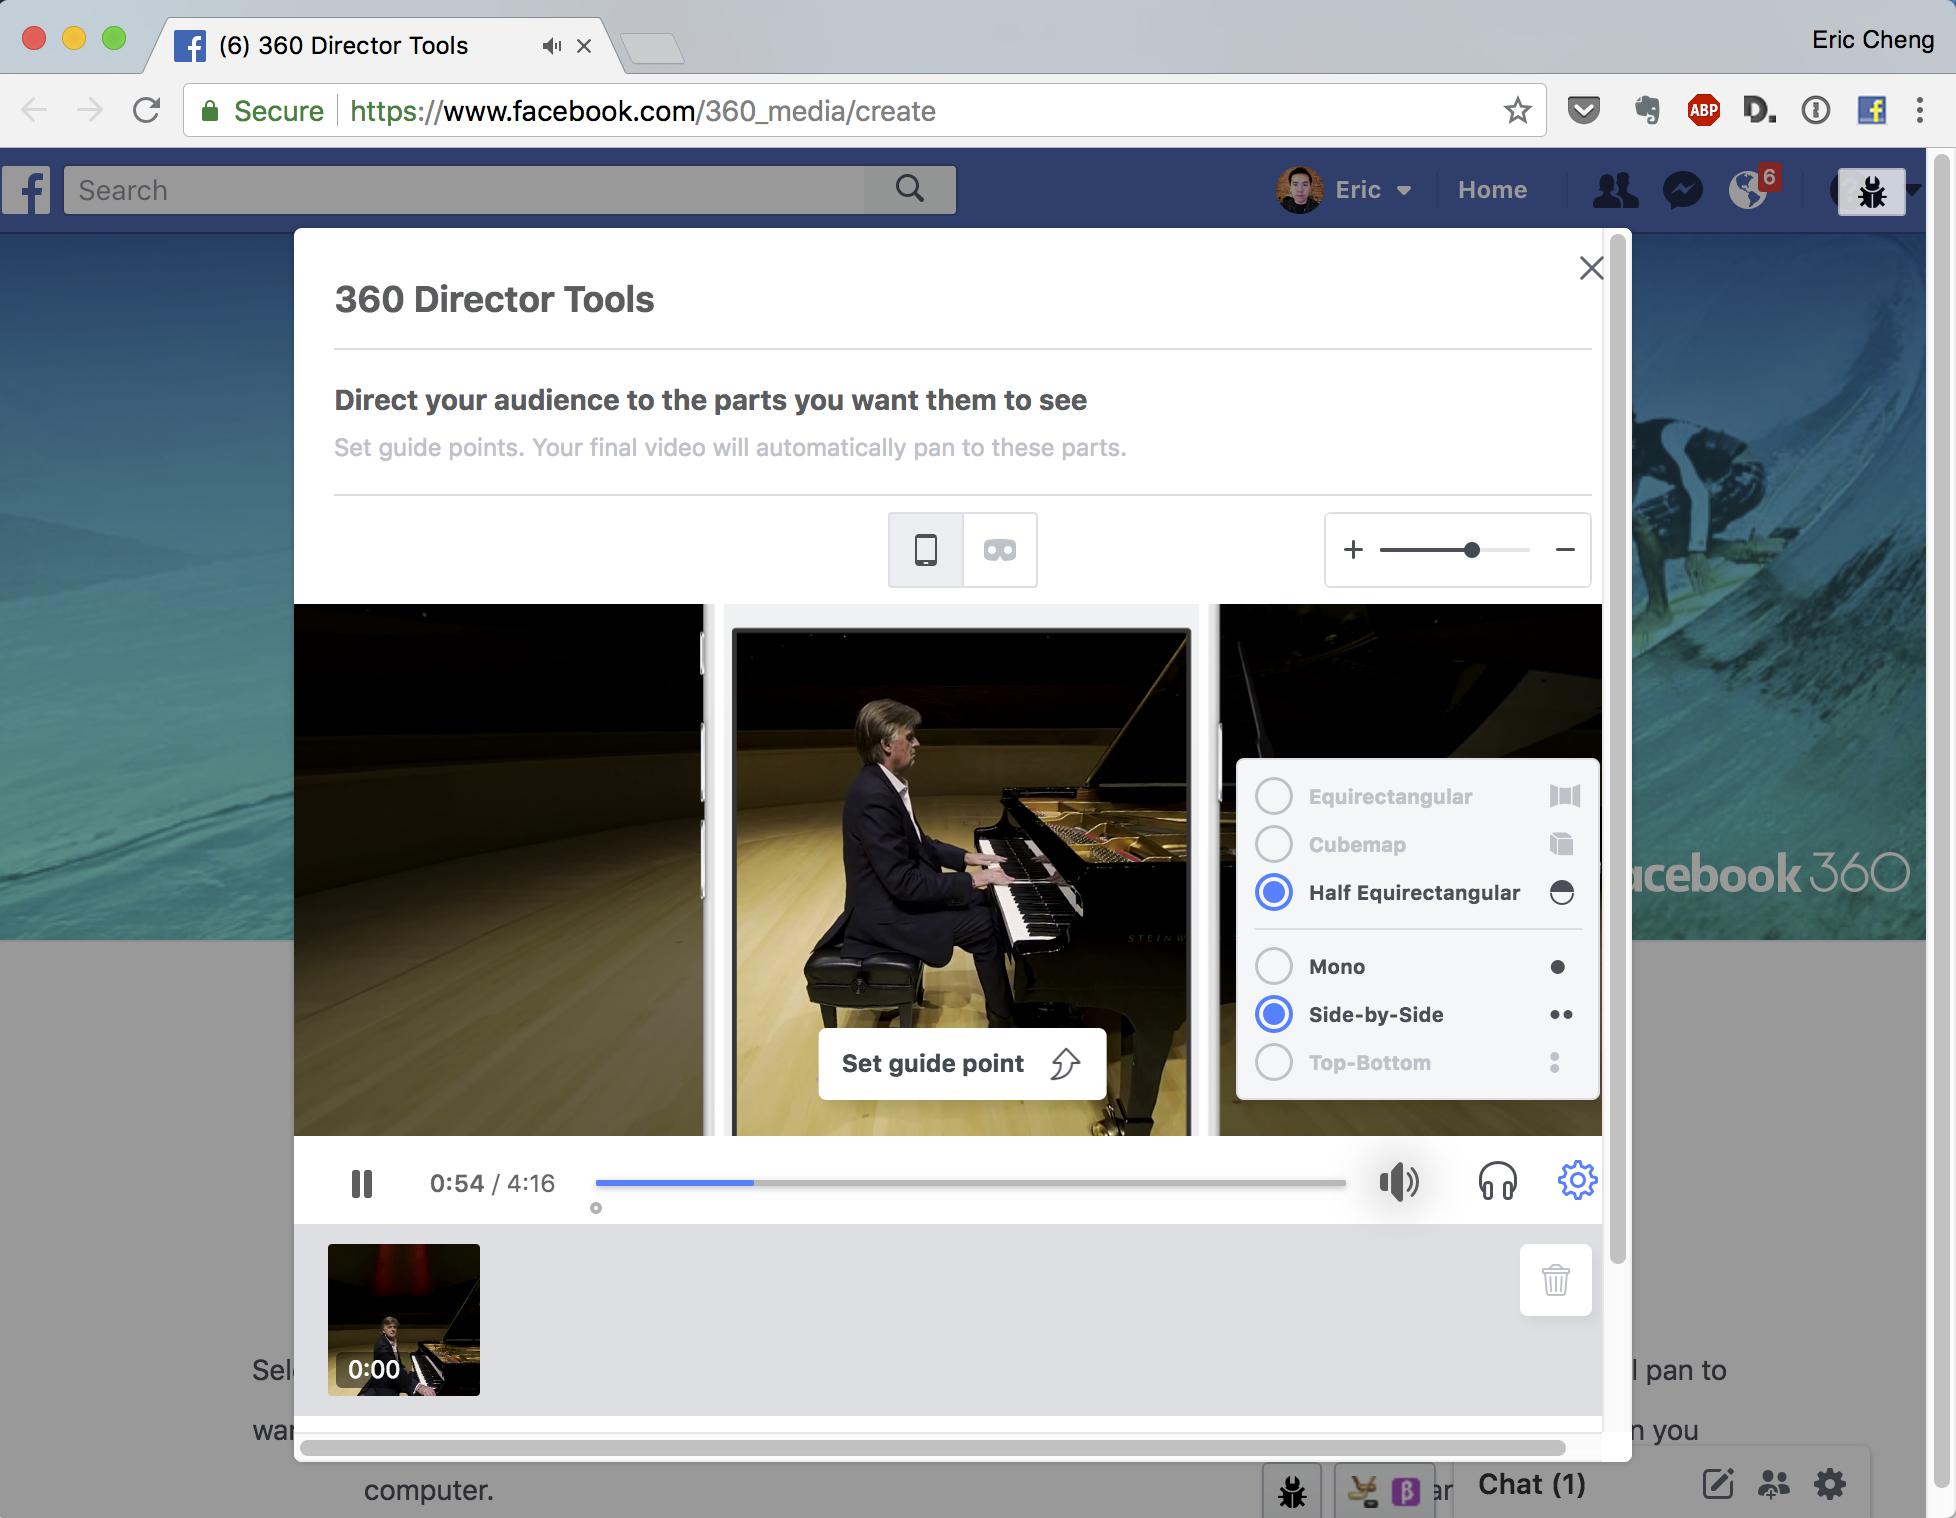 Facebook 360 Director Tools